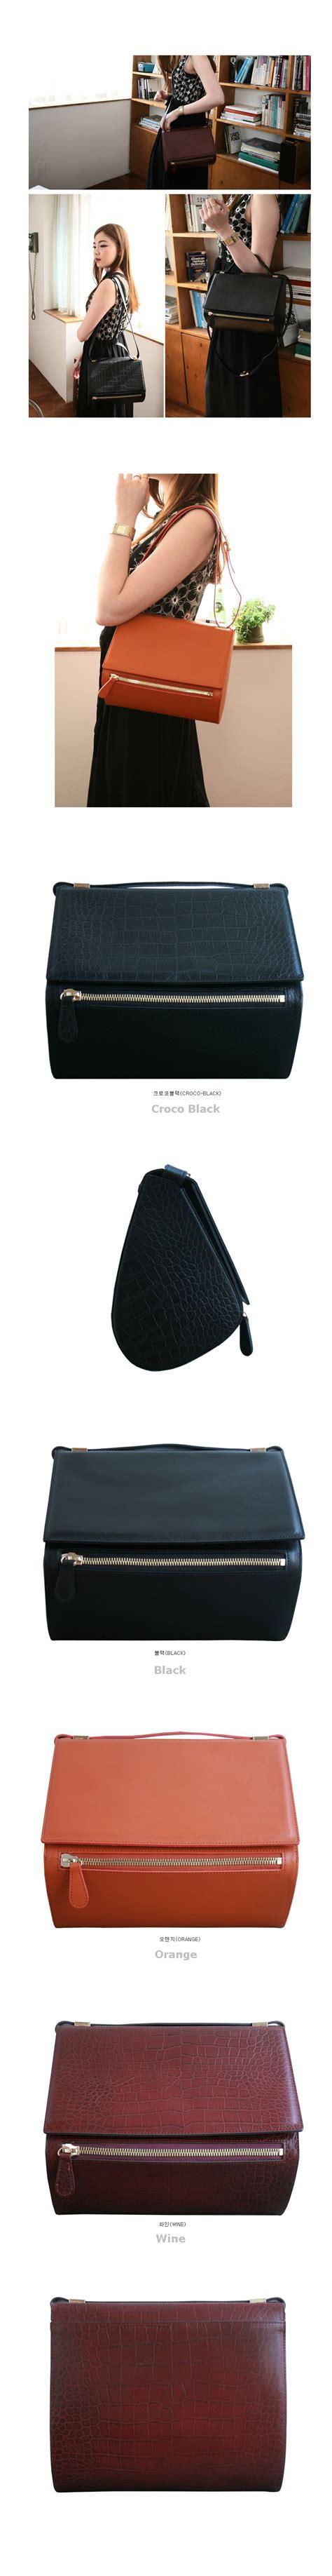 Original Phillipe Jourdan Chad Messenger Bag Brown new leather handbag shoulder bag brown black hobo tote purse designer